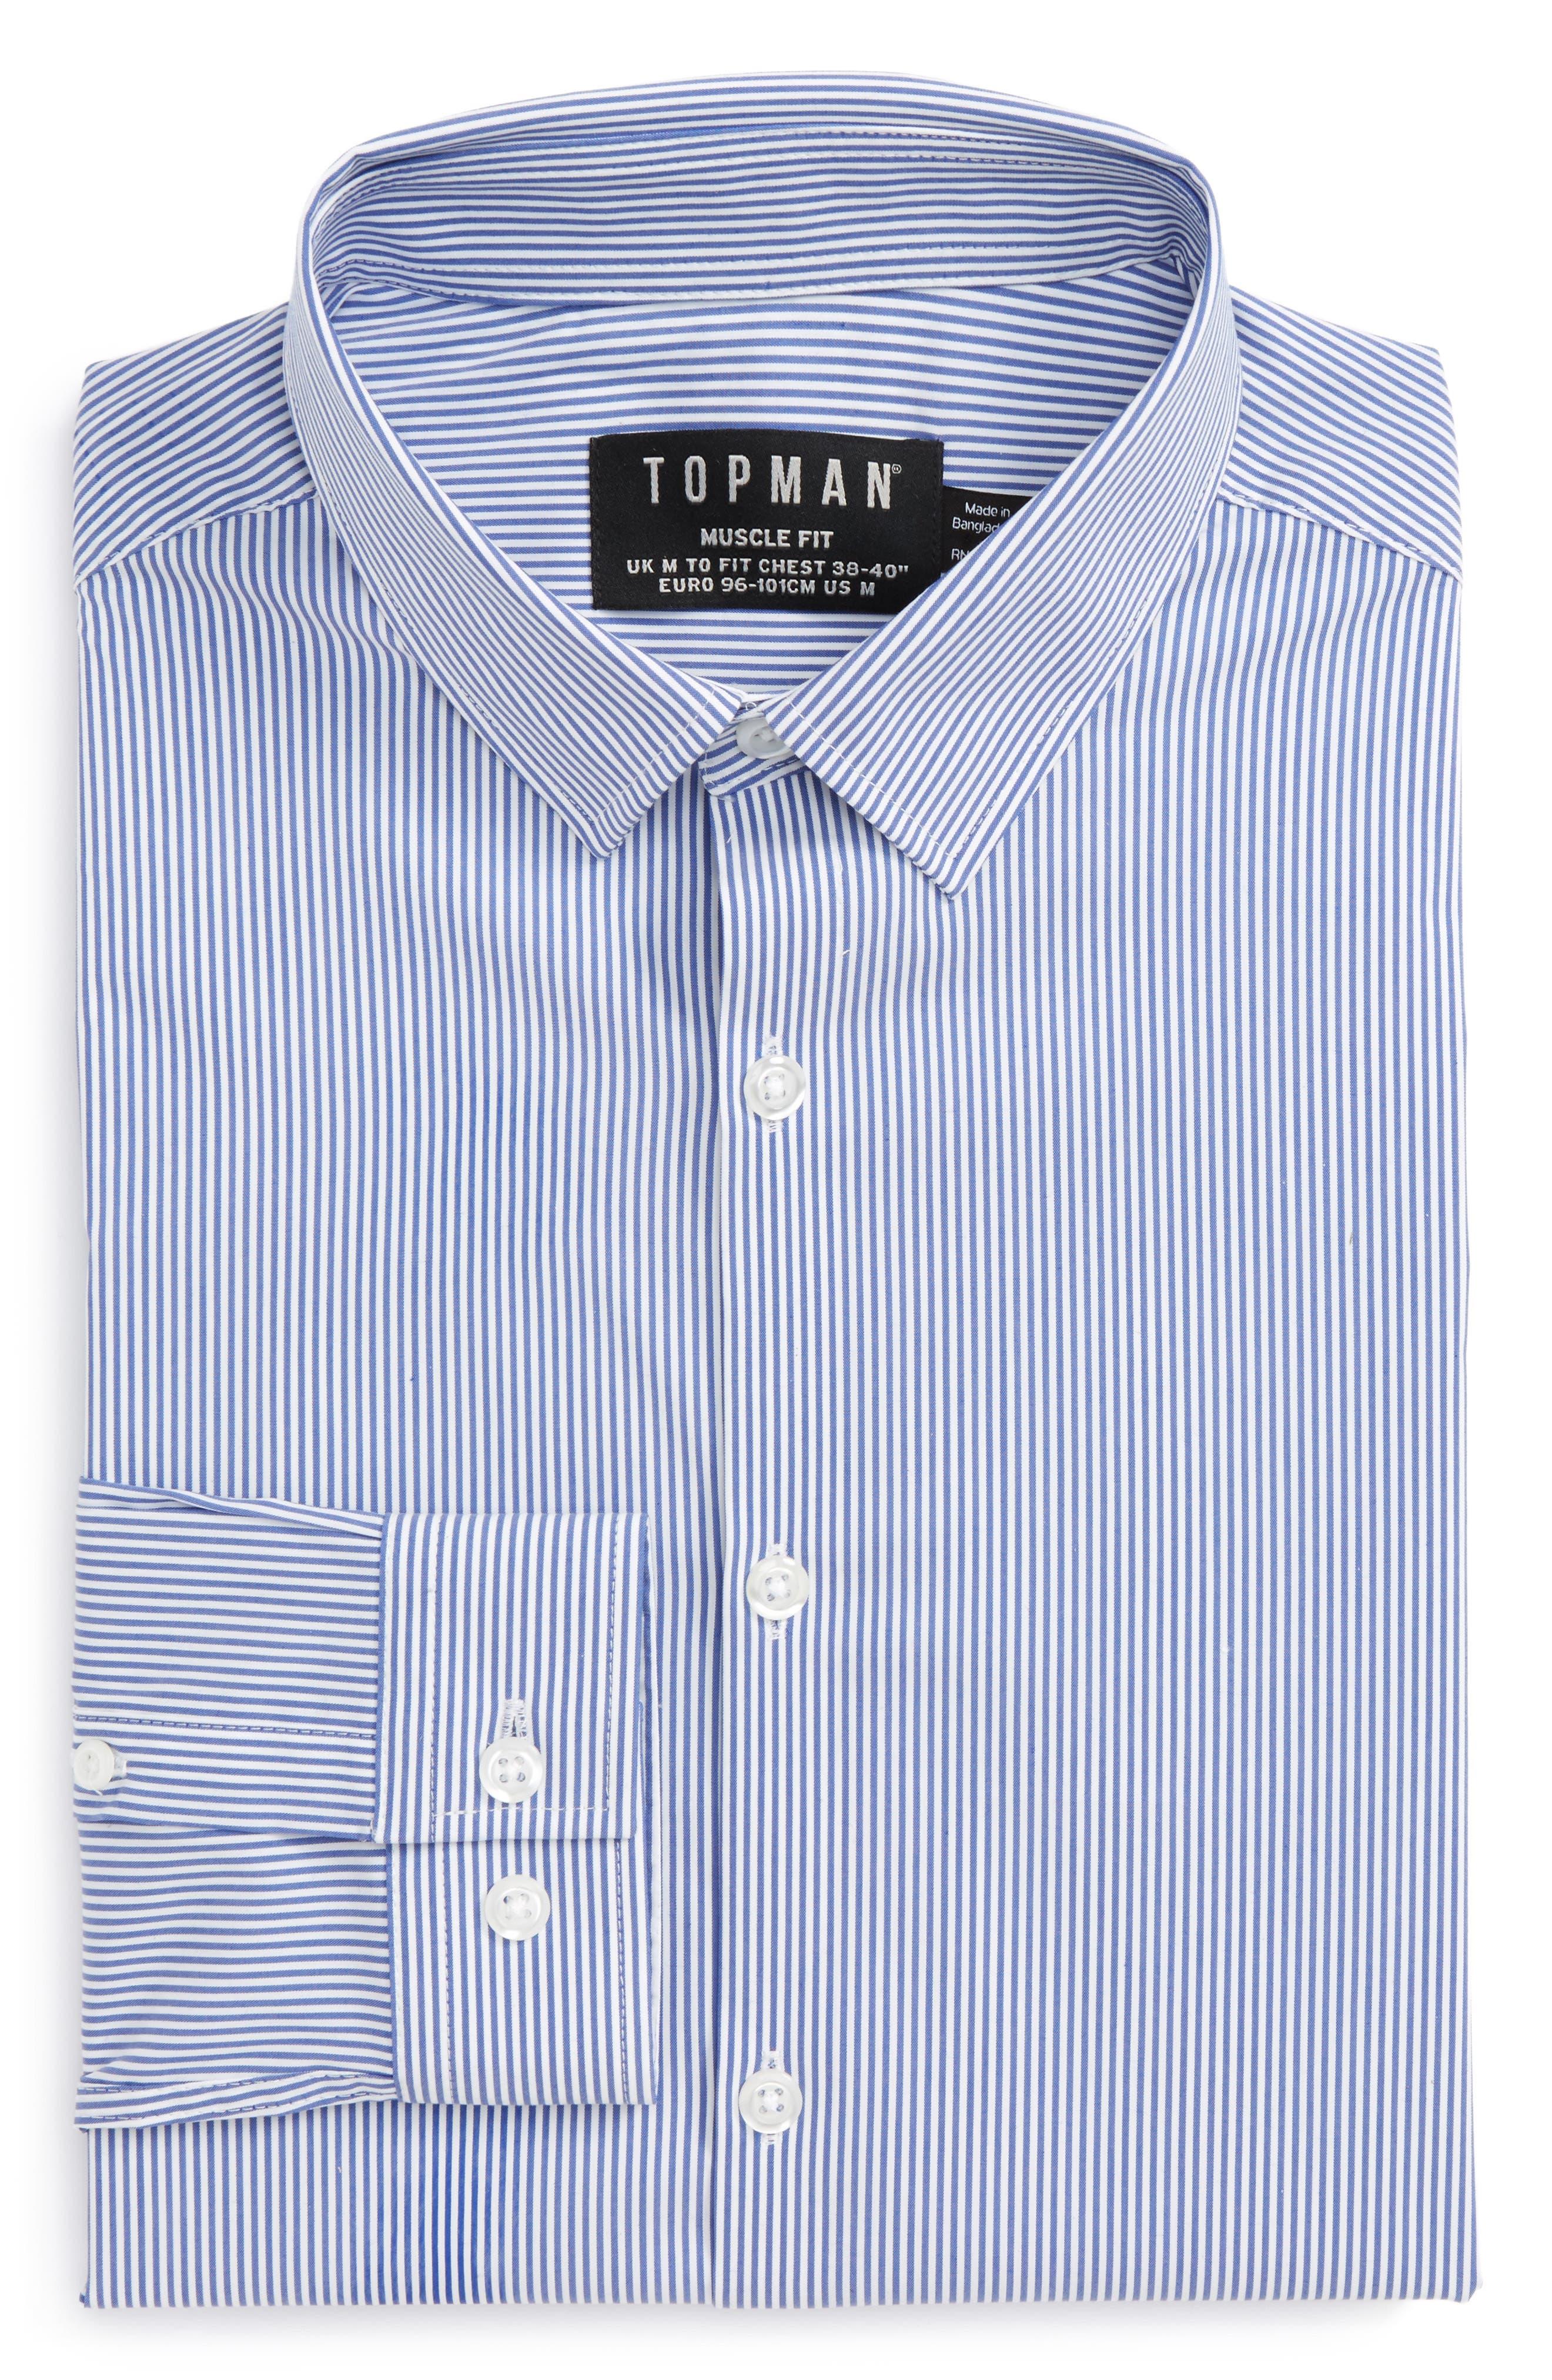 Main Image - Topman Muscle Fit Smart Shirt